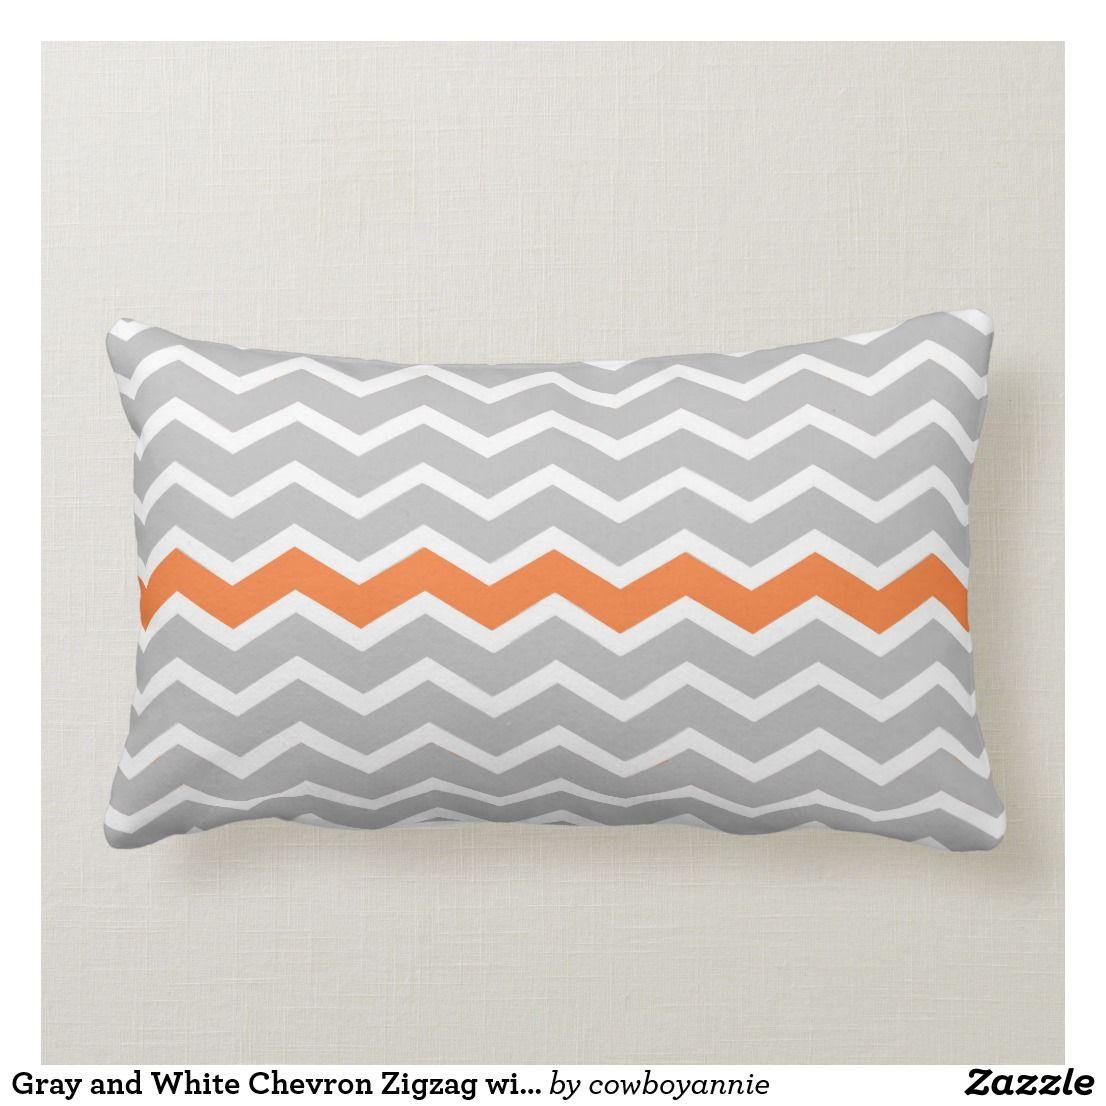 Gray And White Chevron Zigzag With Orange Stripe Lumbar Pillow Zazzle Com Orange Pillows Decorative Lumbar Pillow Orange Pillows